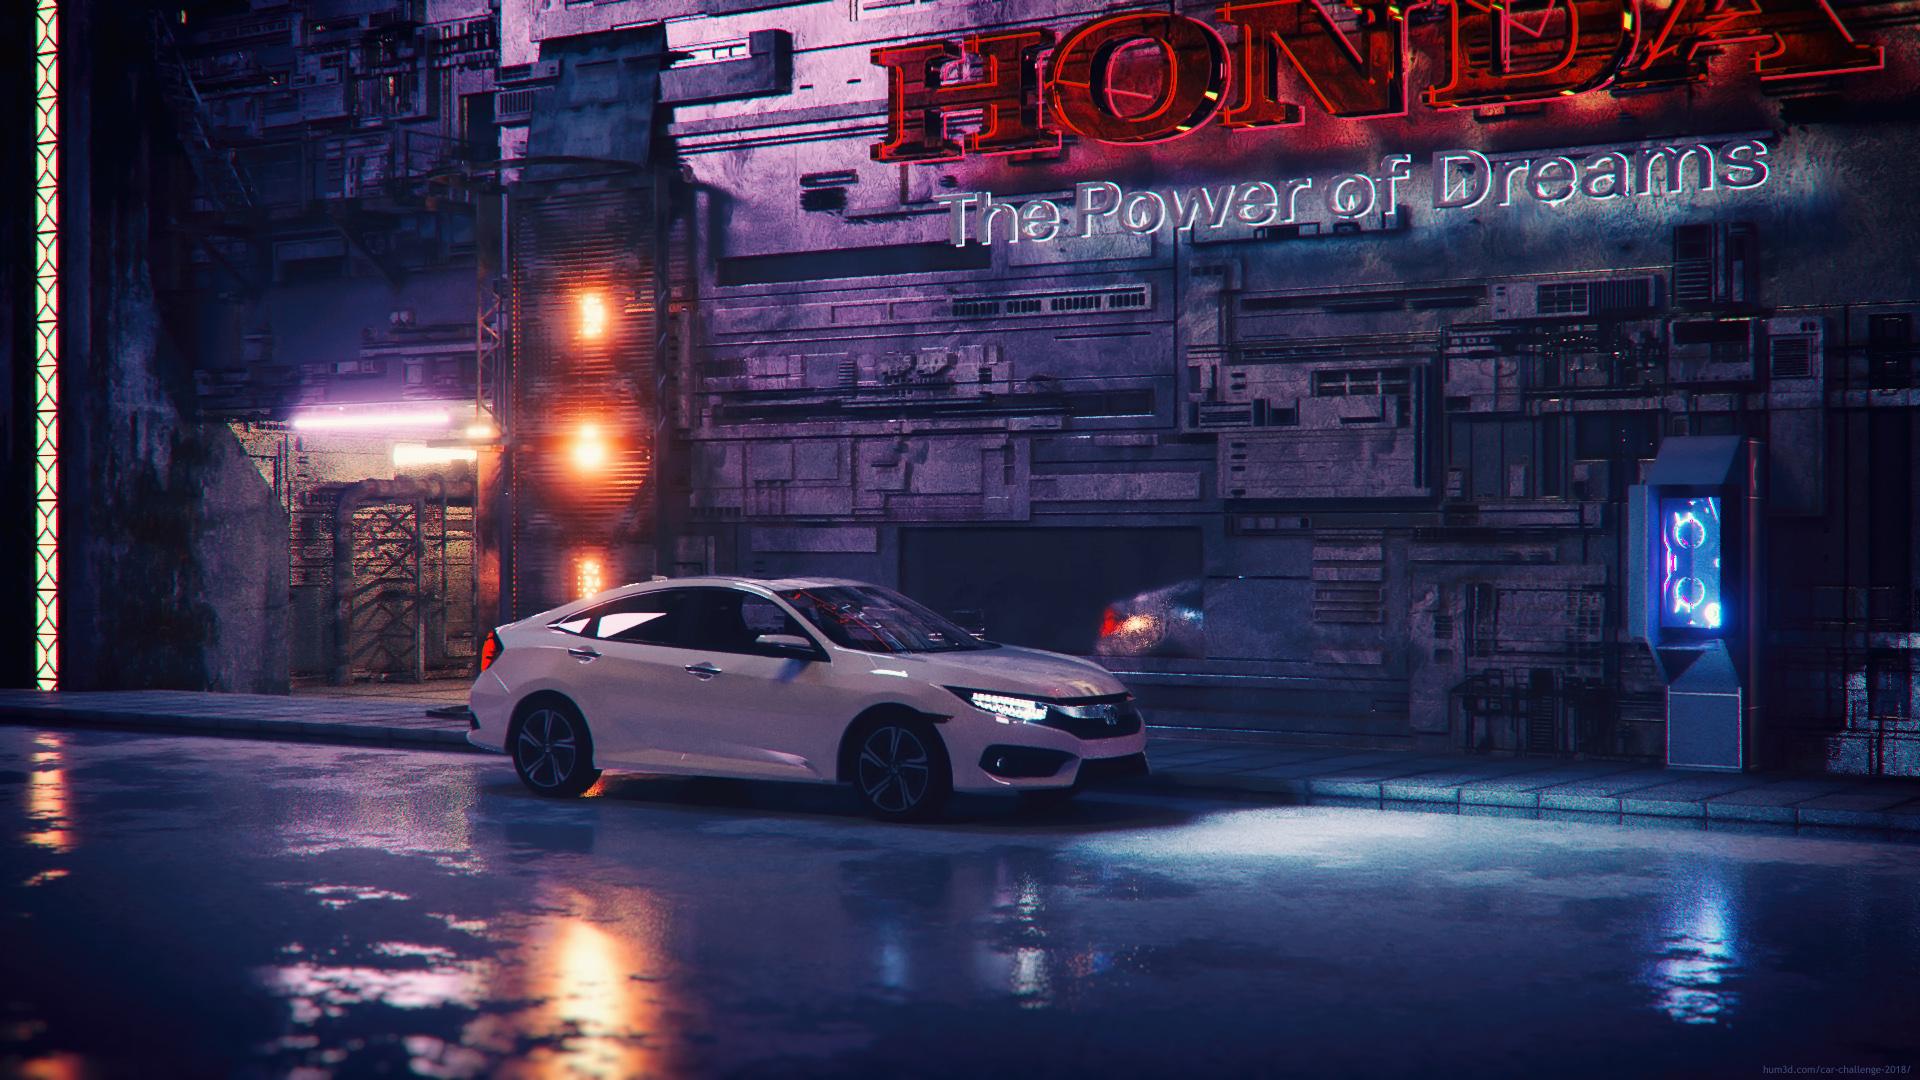 Honda Cyberpunk 3d art